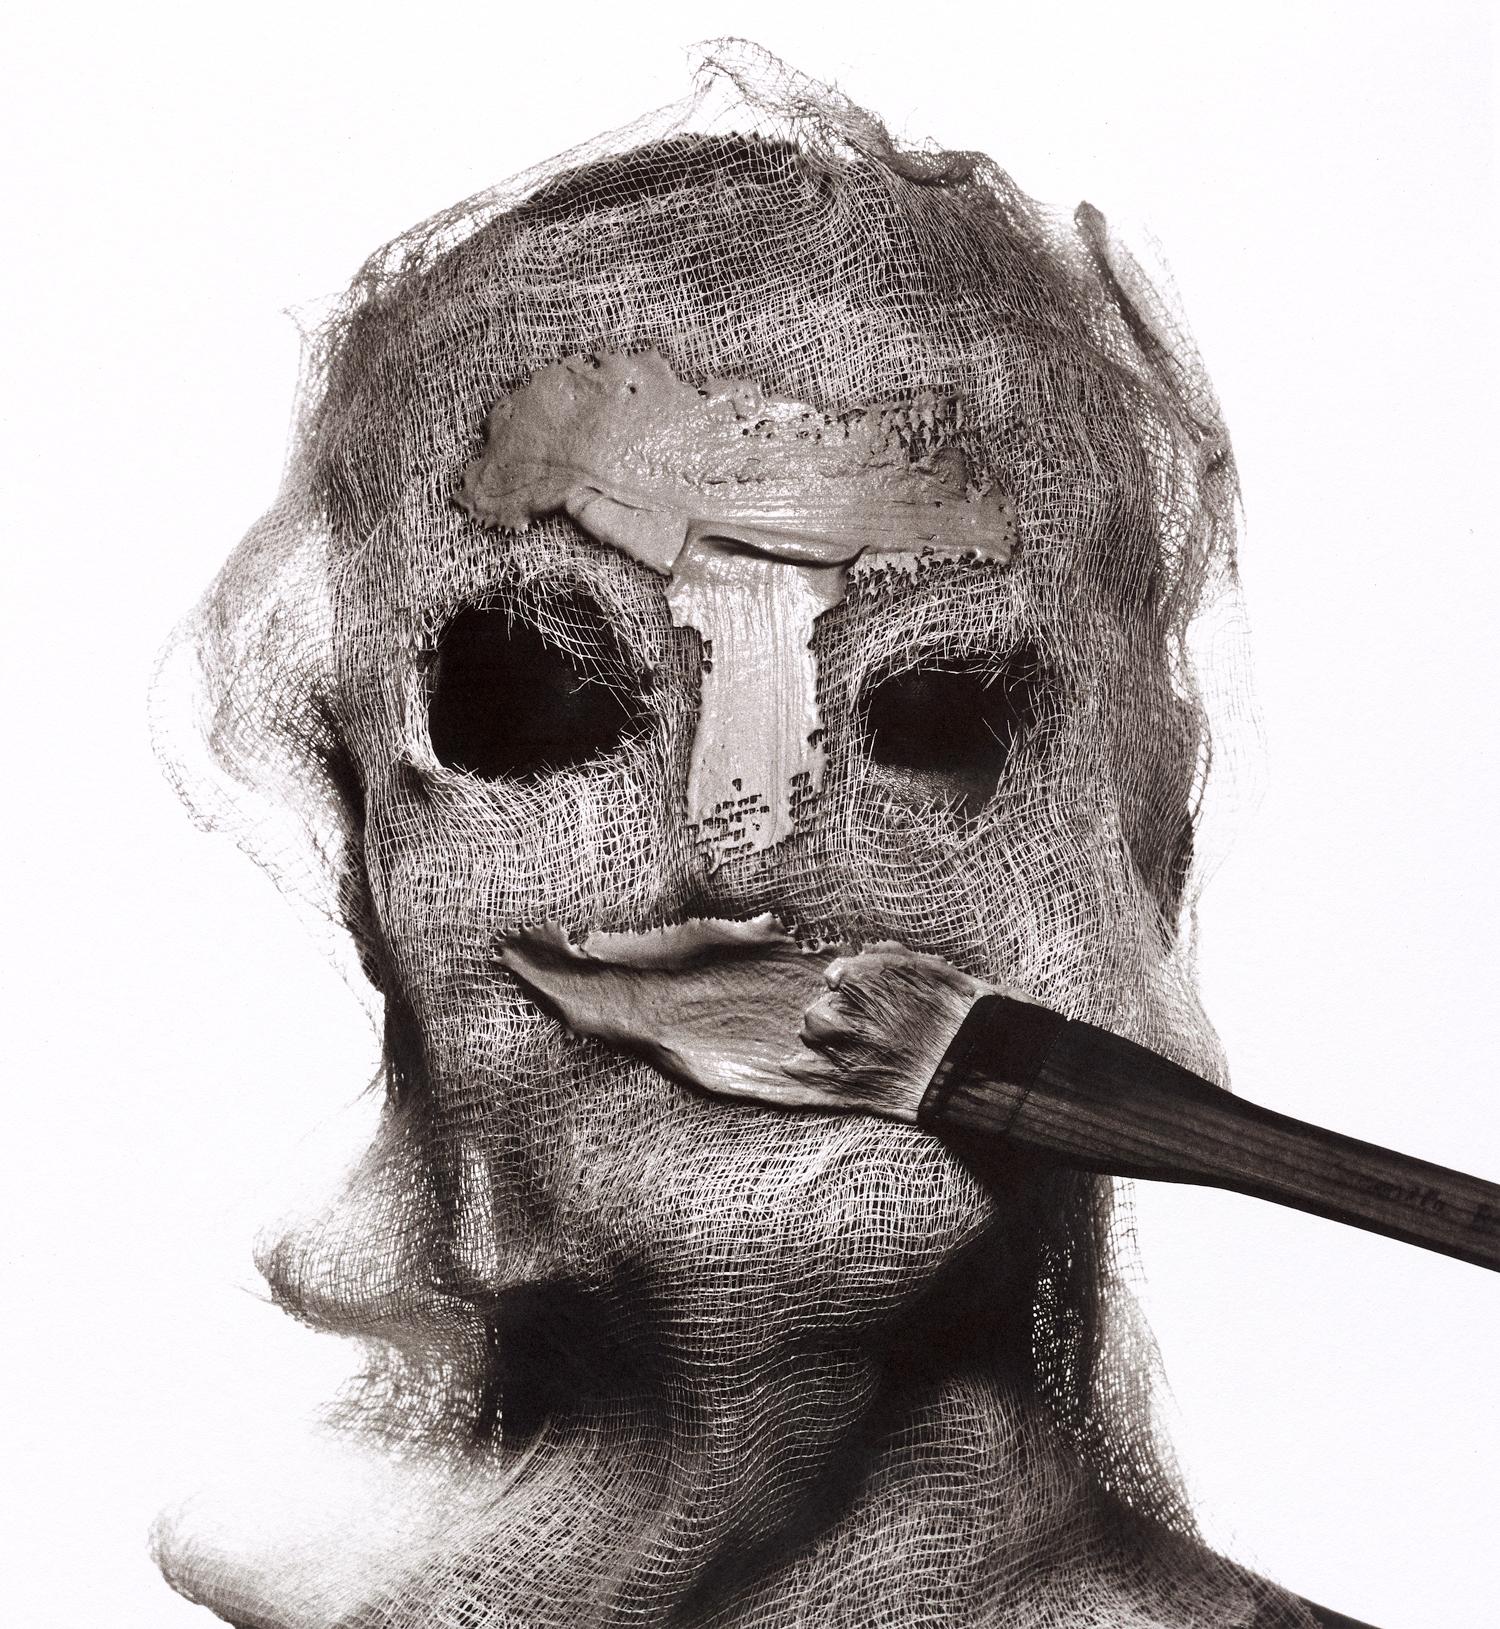 Beauty Treatment with Gauze Mask , New York, 1997 Platinum-palladium print © Condé Nast